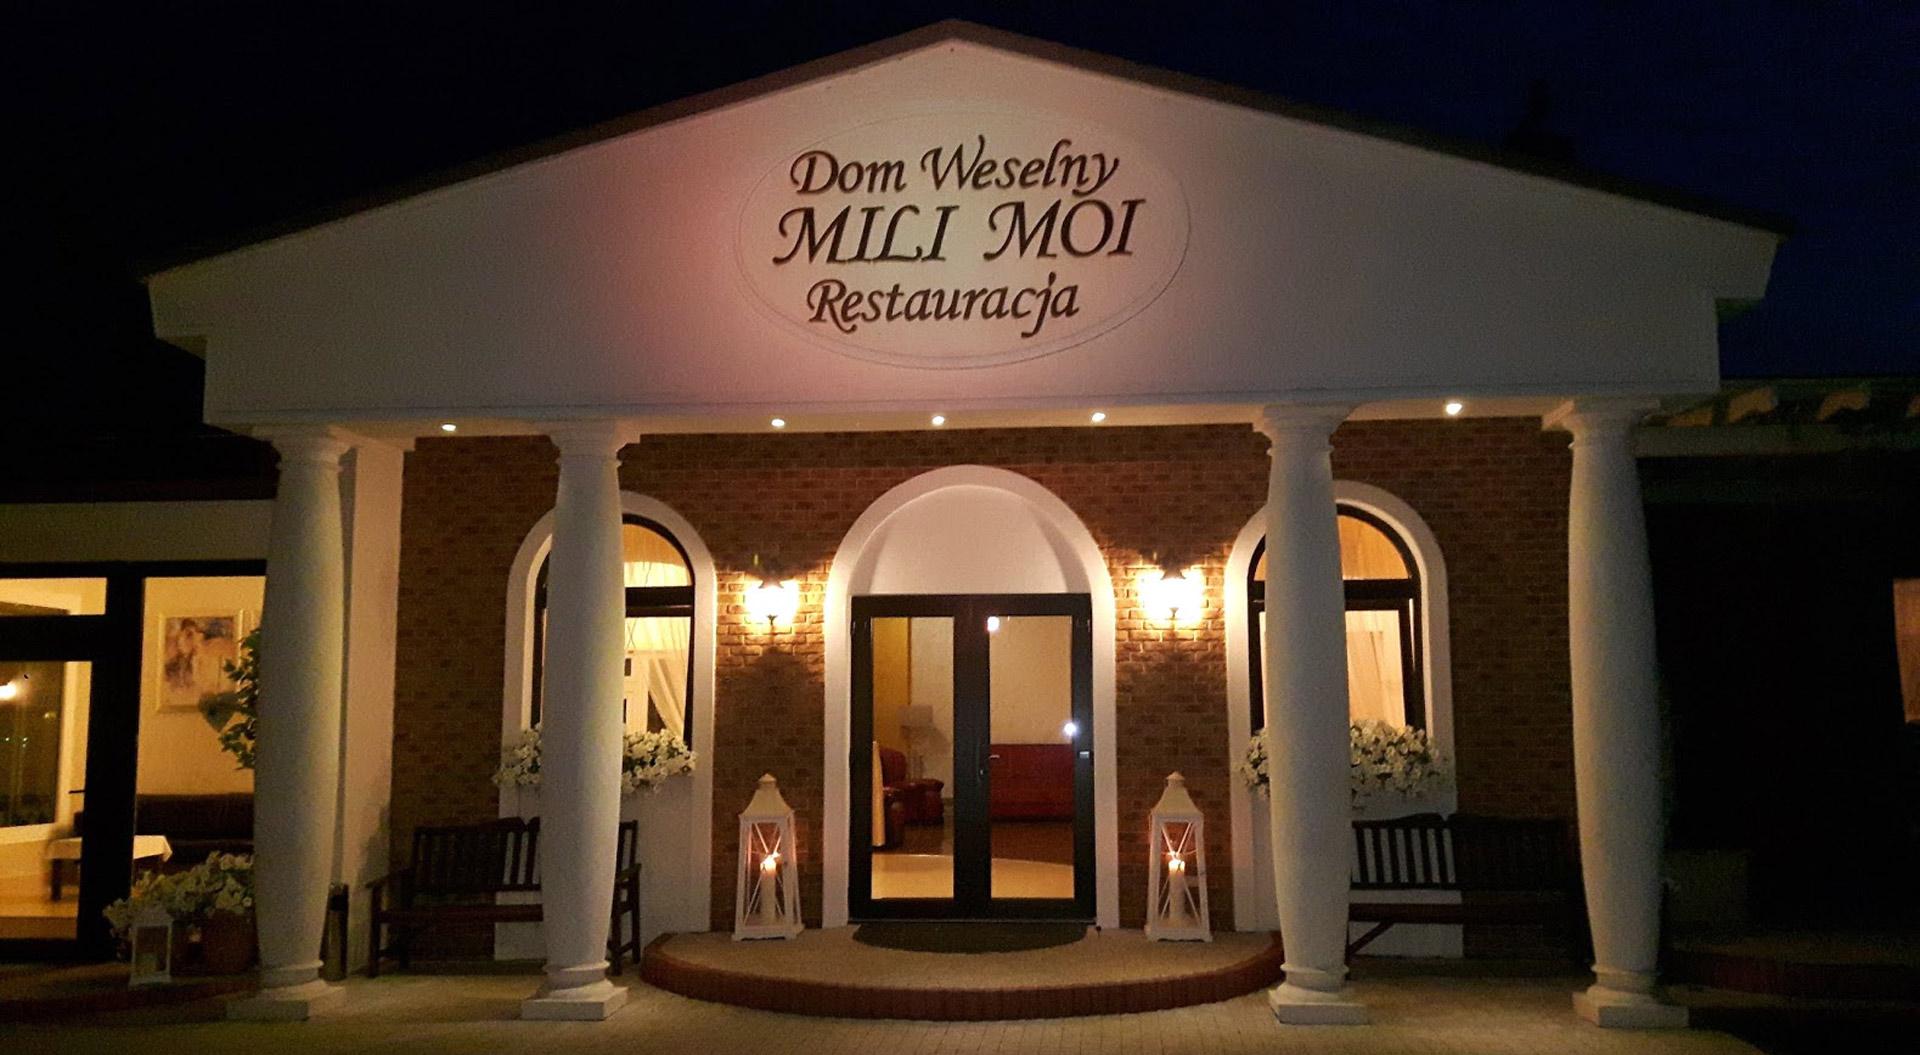 Mili Moi - Restauracja - Dom Weselny